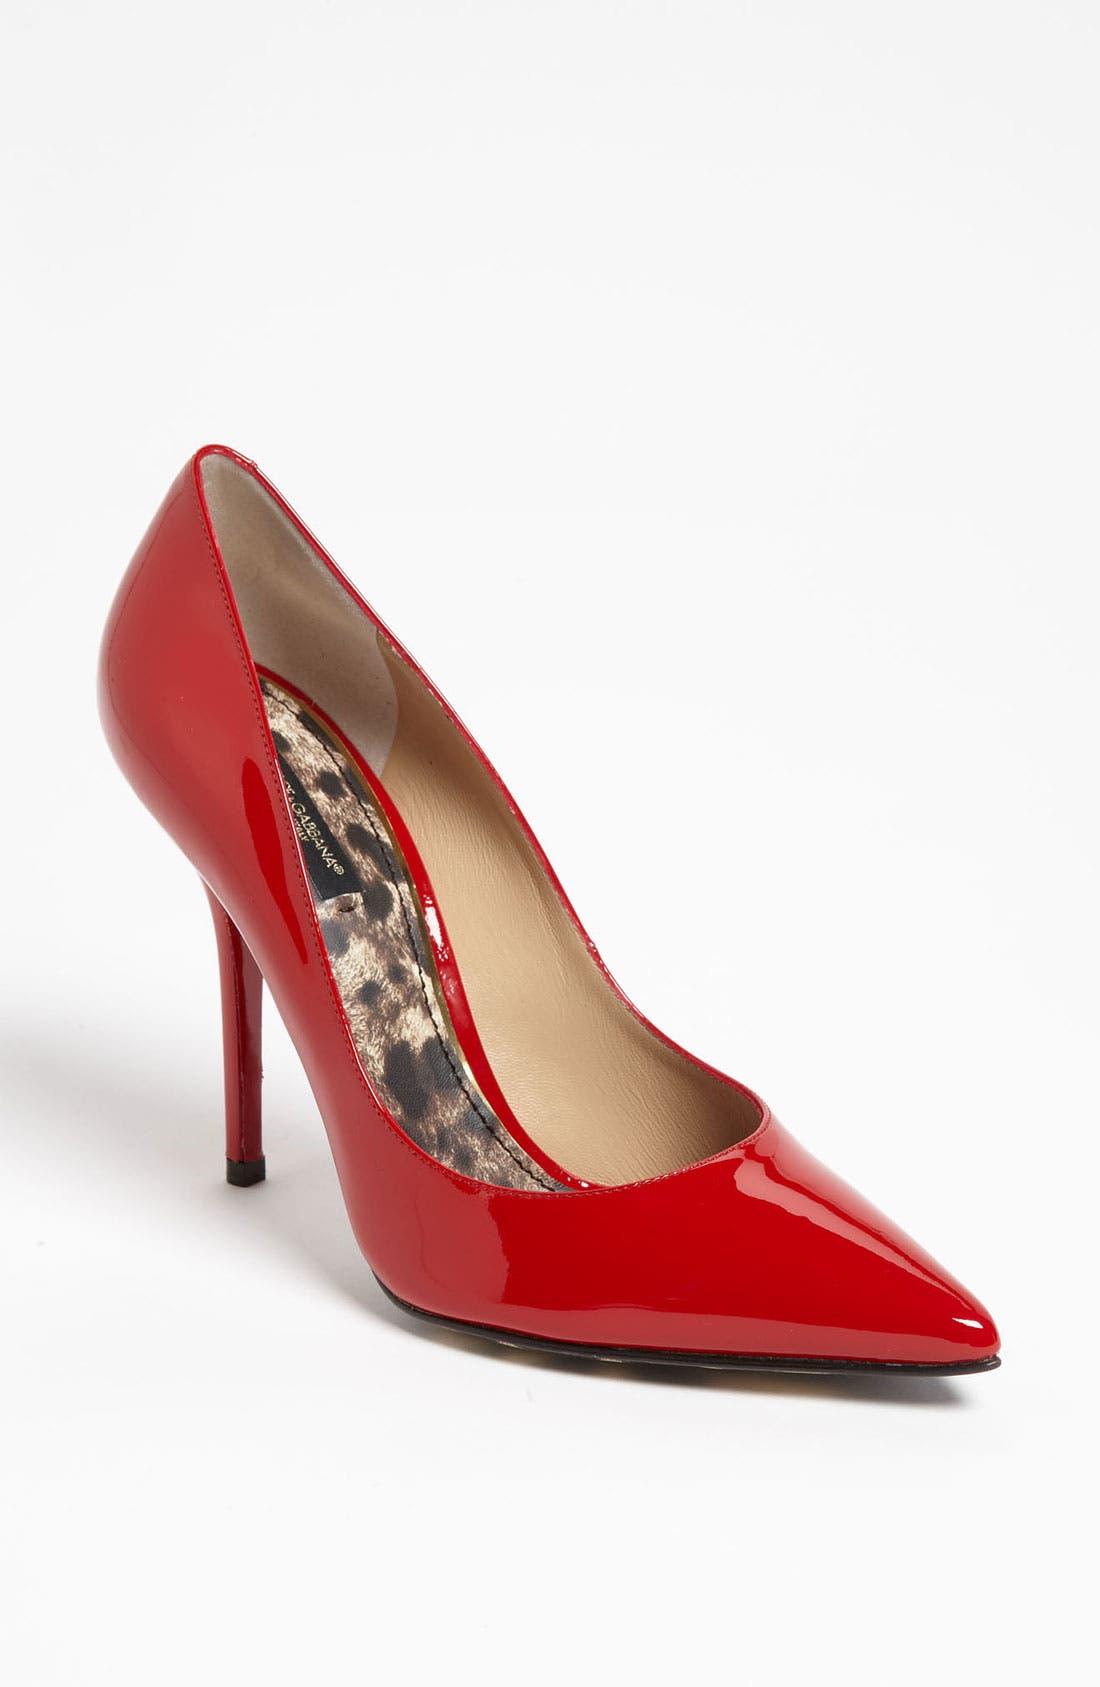 Main Image - Dolce&Gabbana Patent Pump